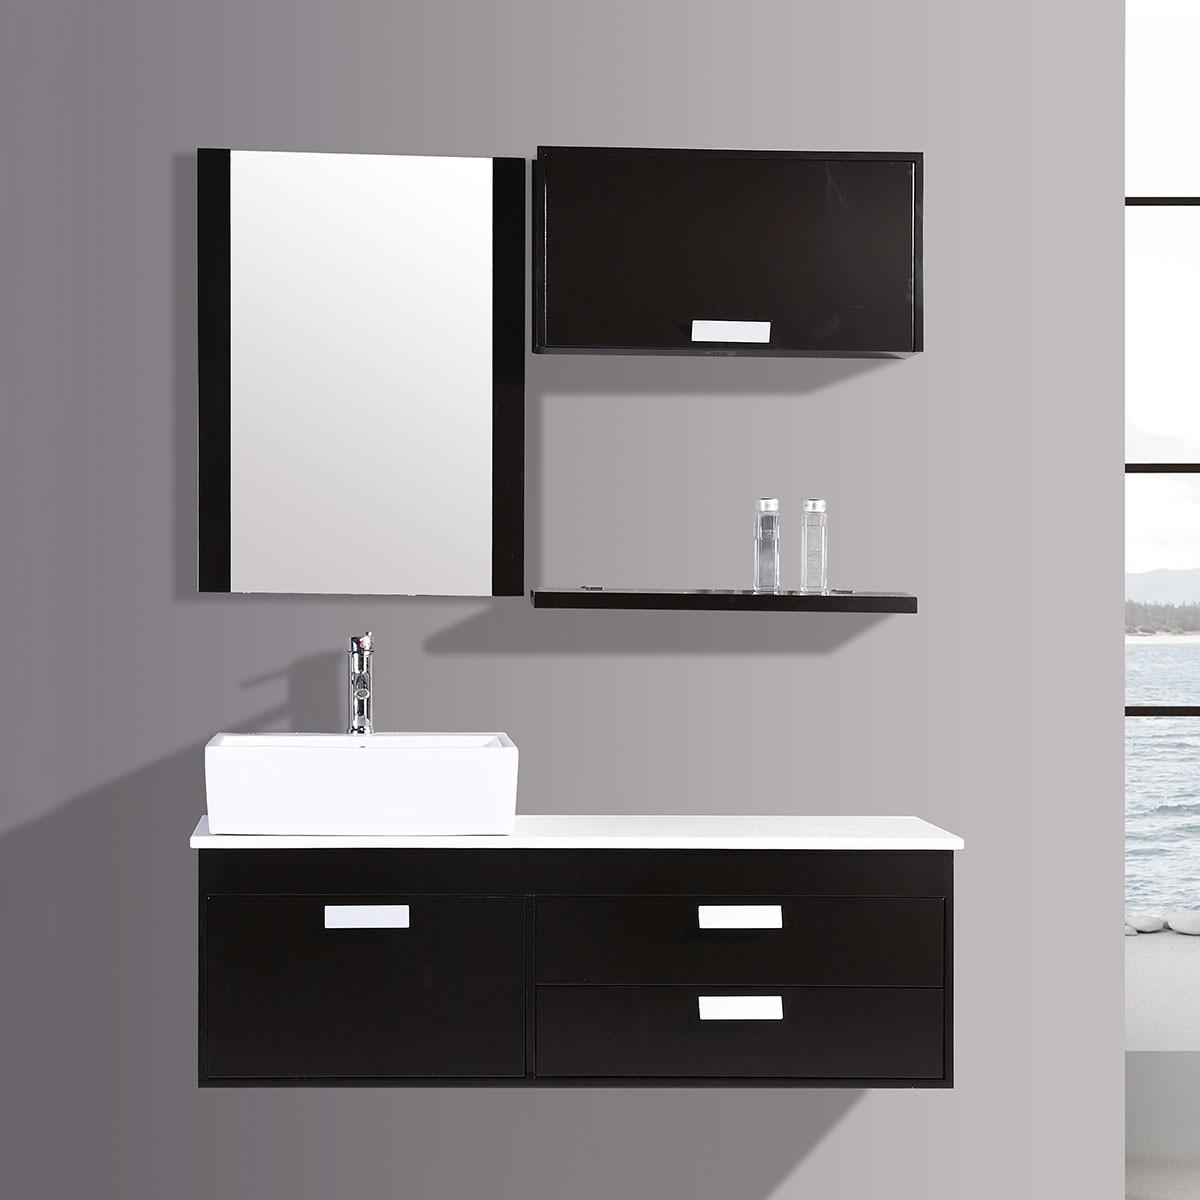 51 In. Espresso Plywood Vanity Sets (DK-T9099B-SET)